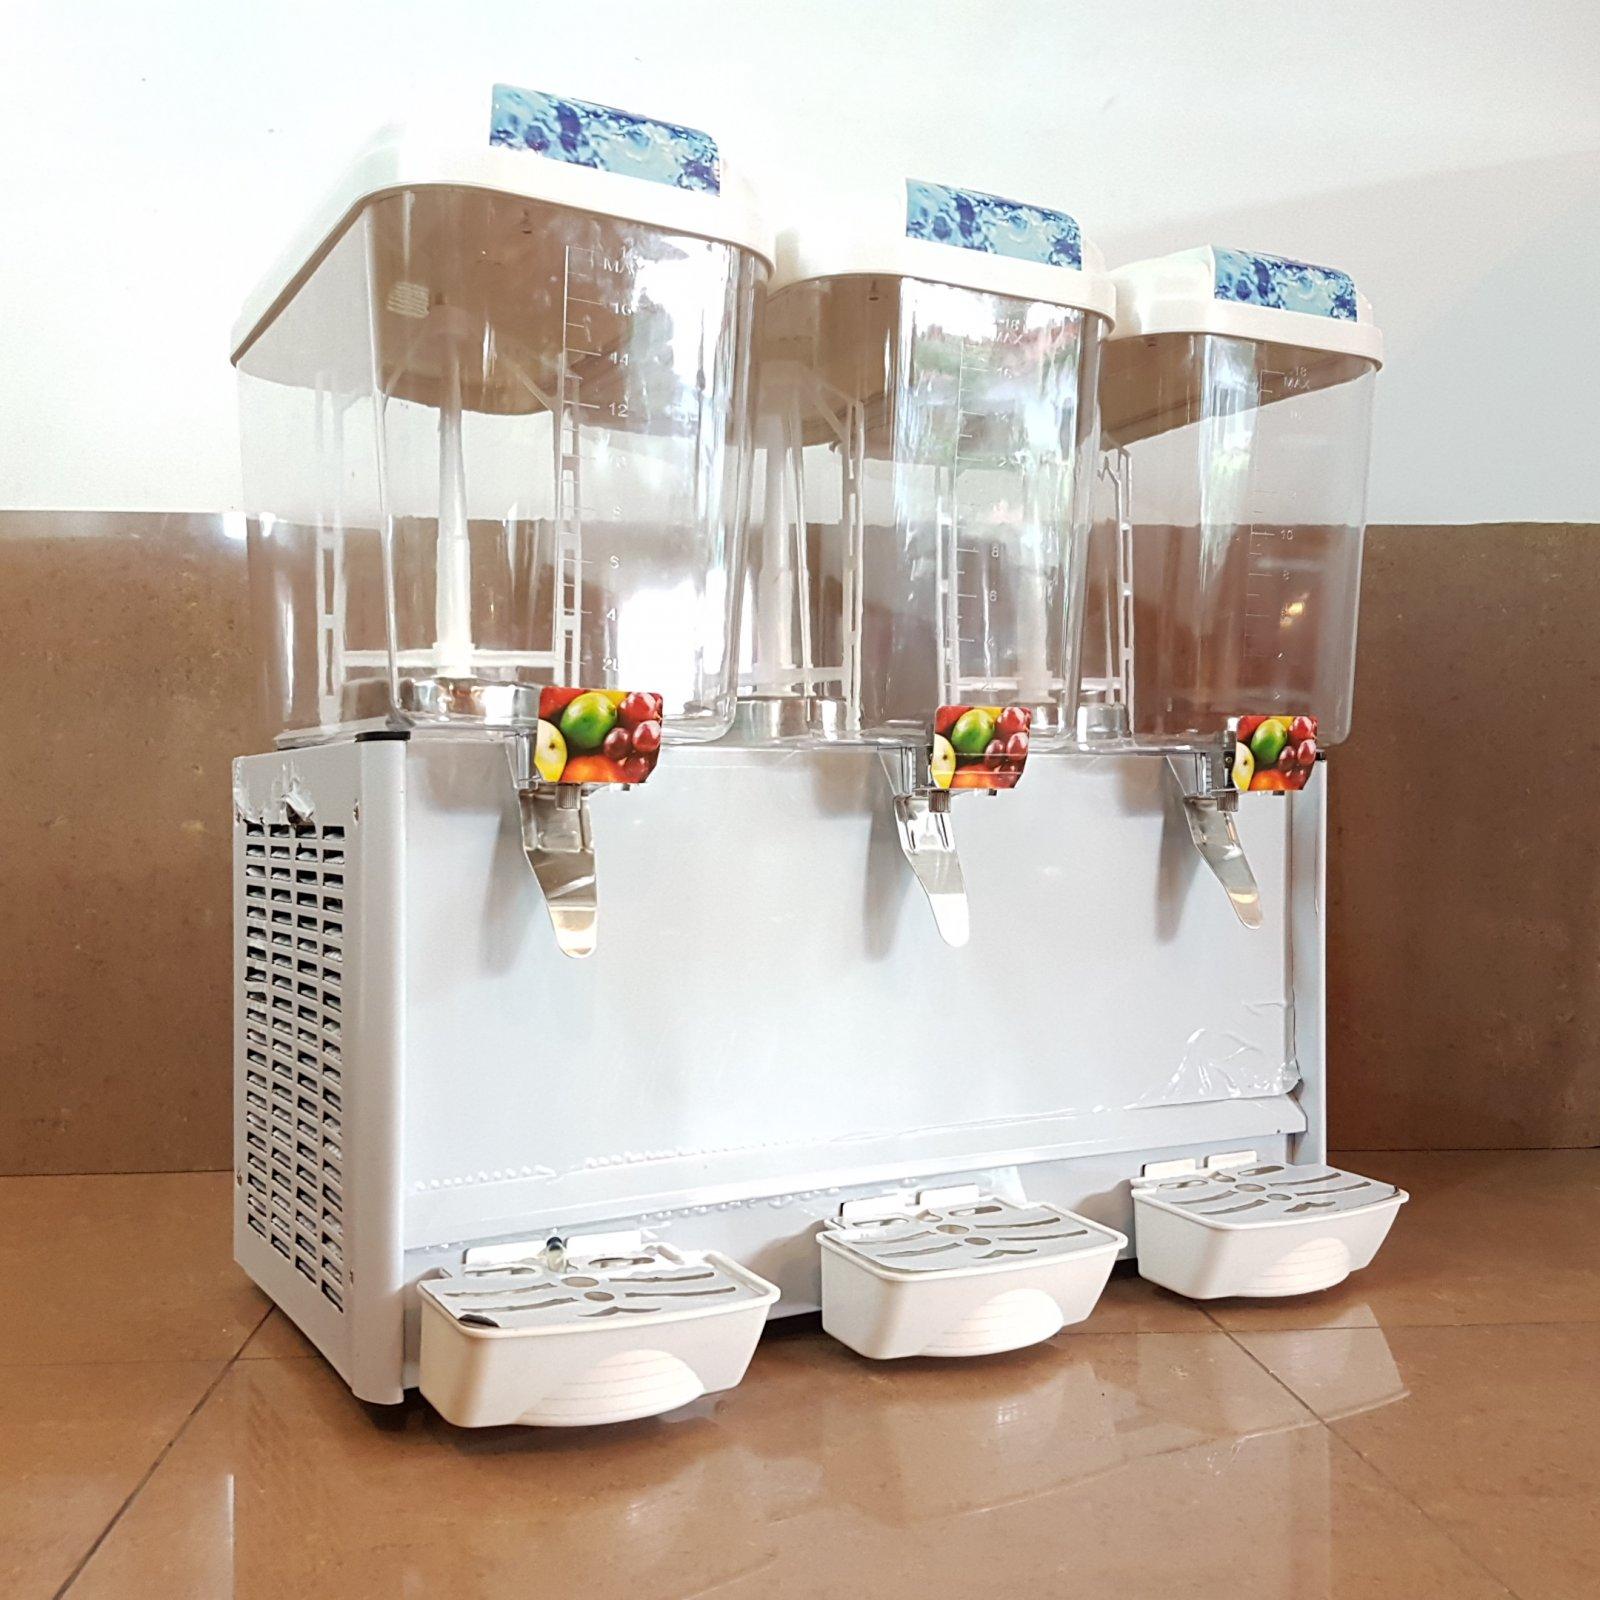 Curd Churning Machine Buy Online